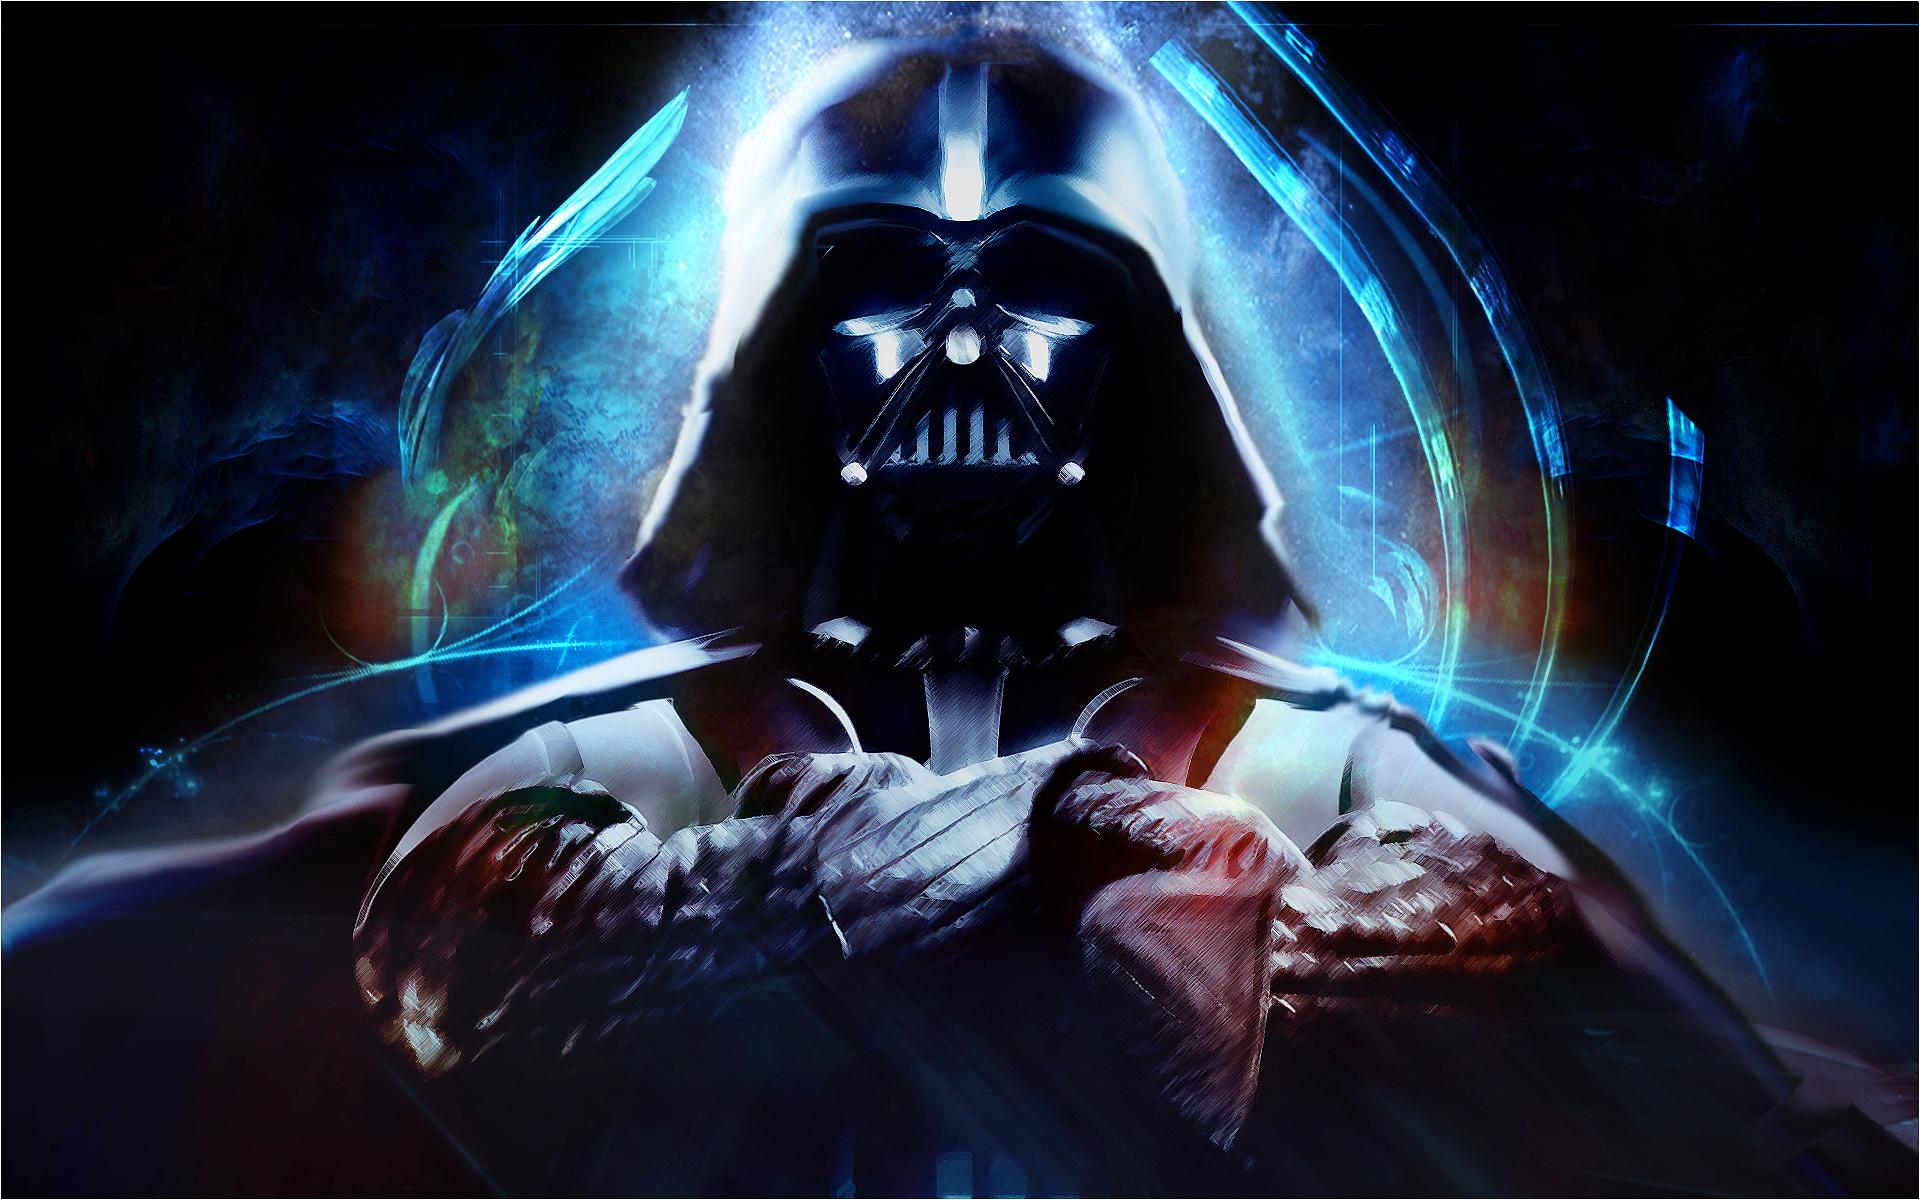 Darth Vader by SeanCoey